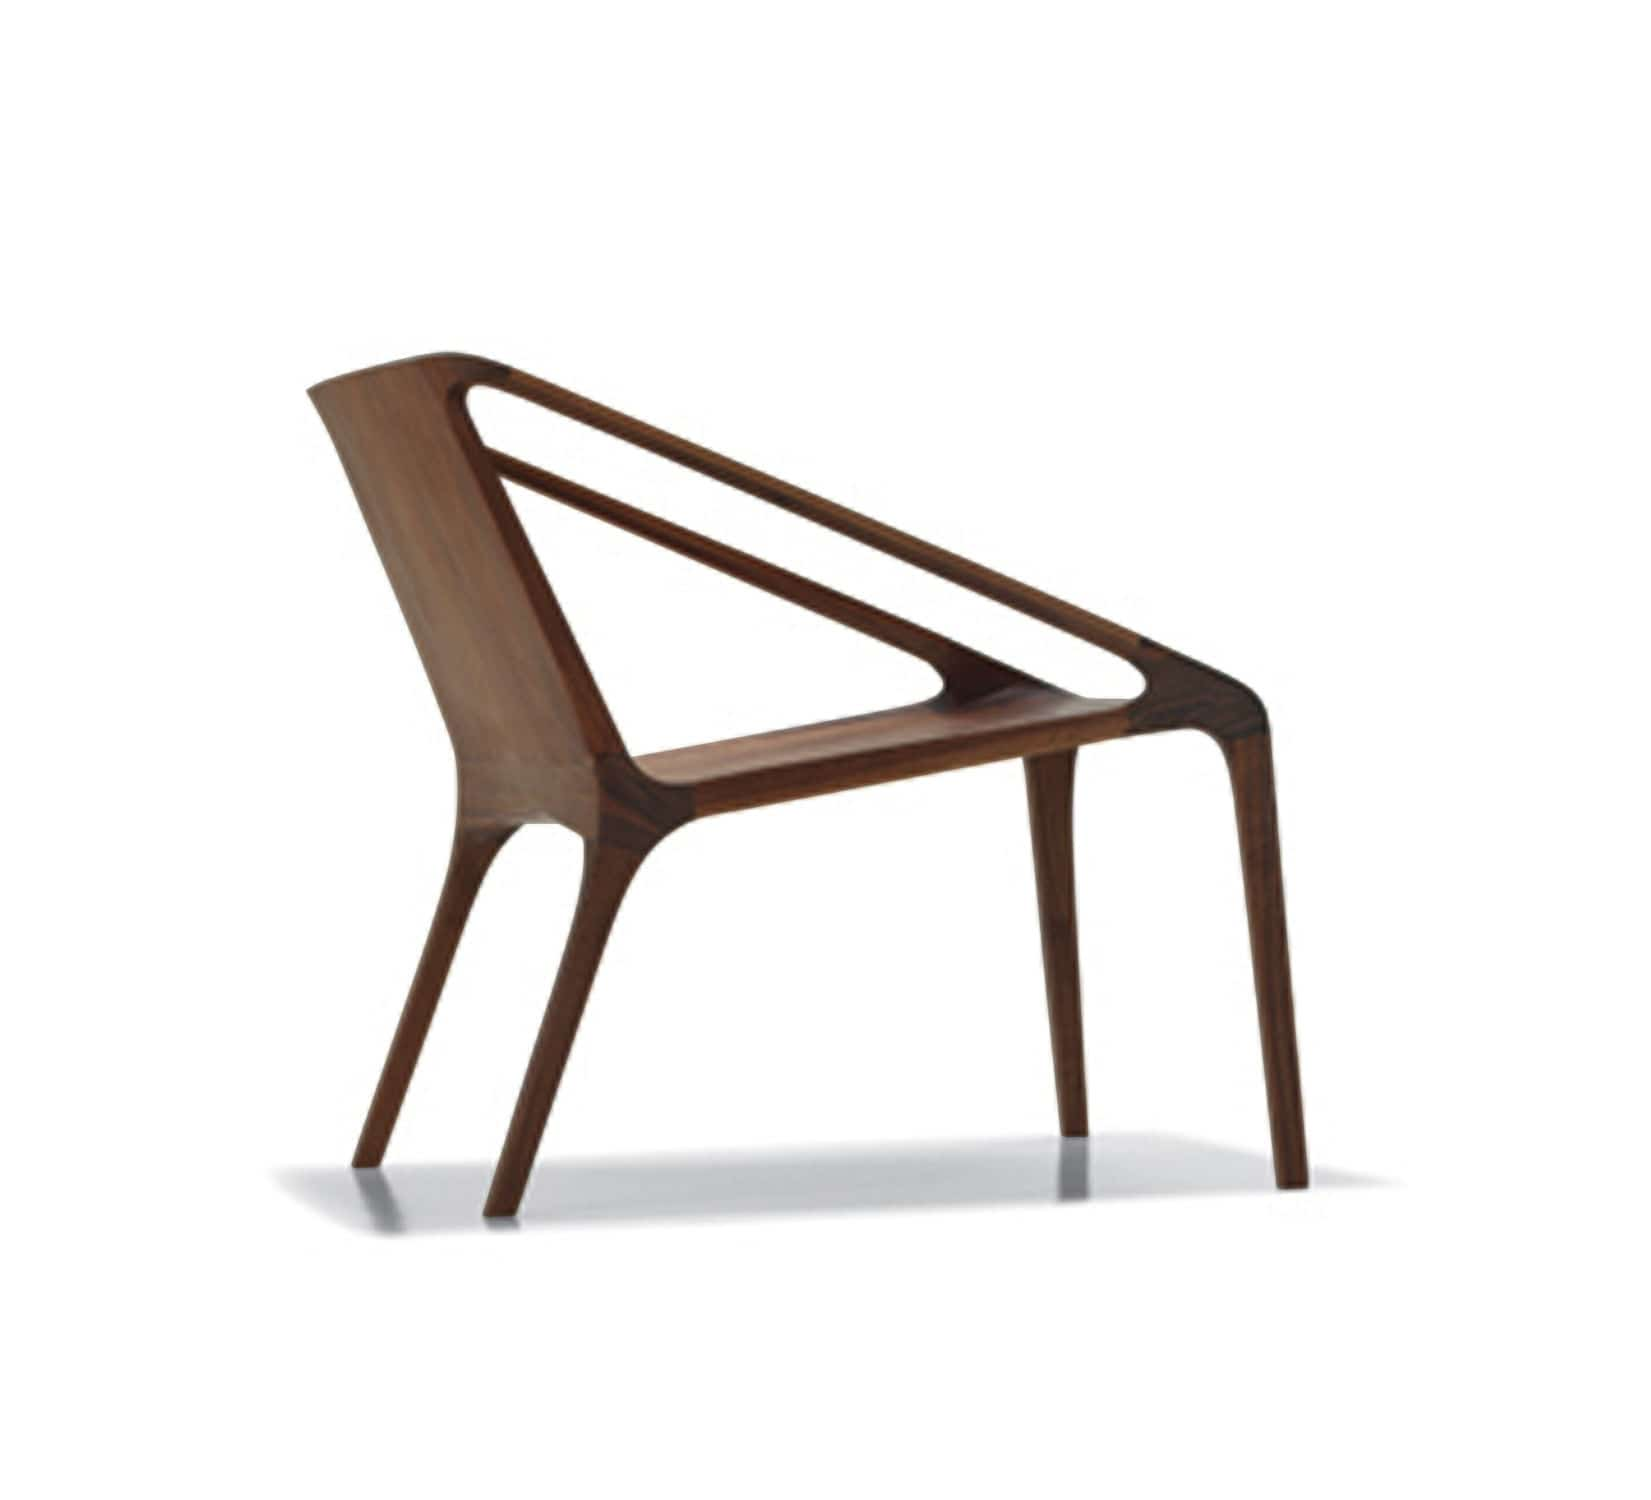 Moderner Sessel / Holz LOFT By Shelly Shelly BERNHARD Design .